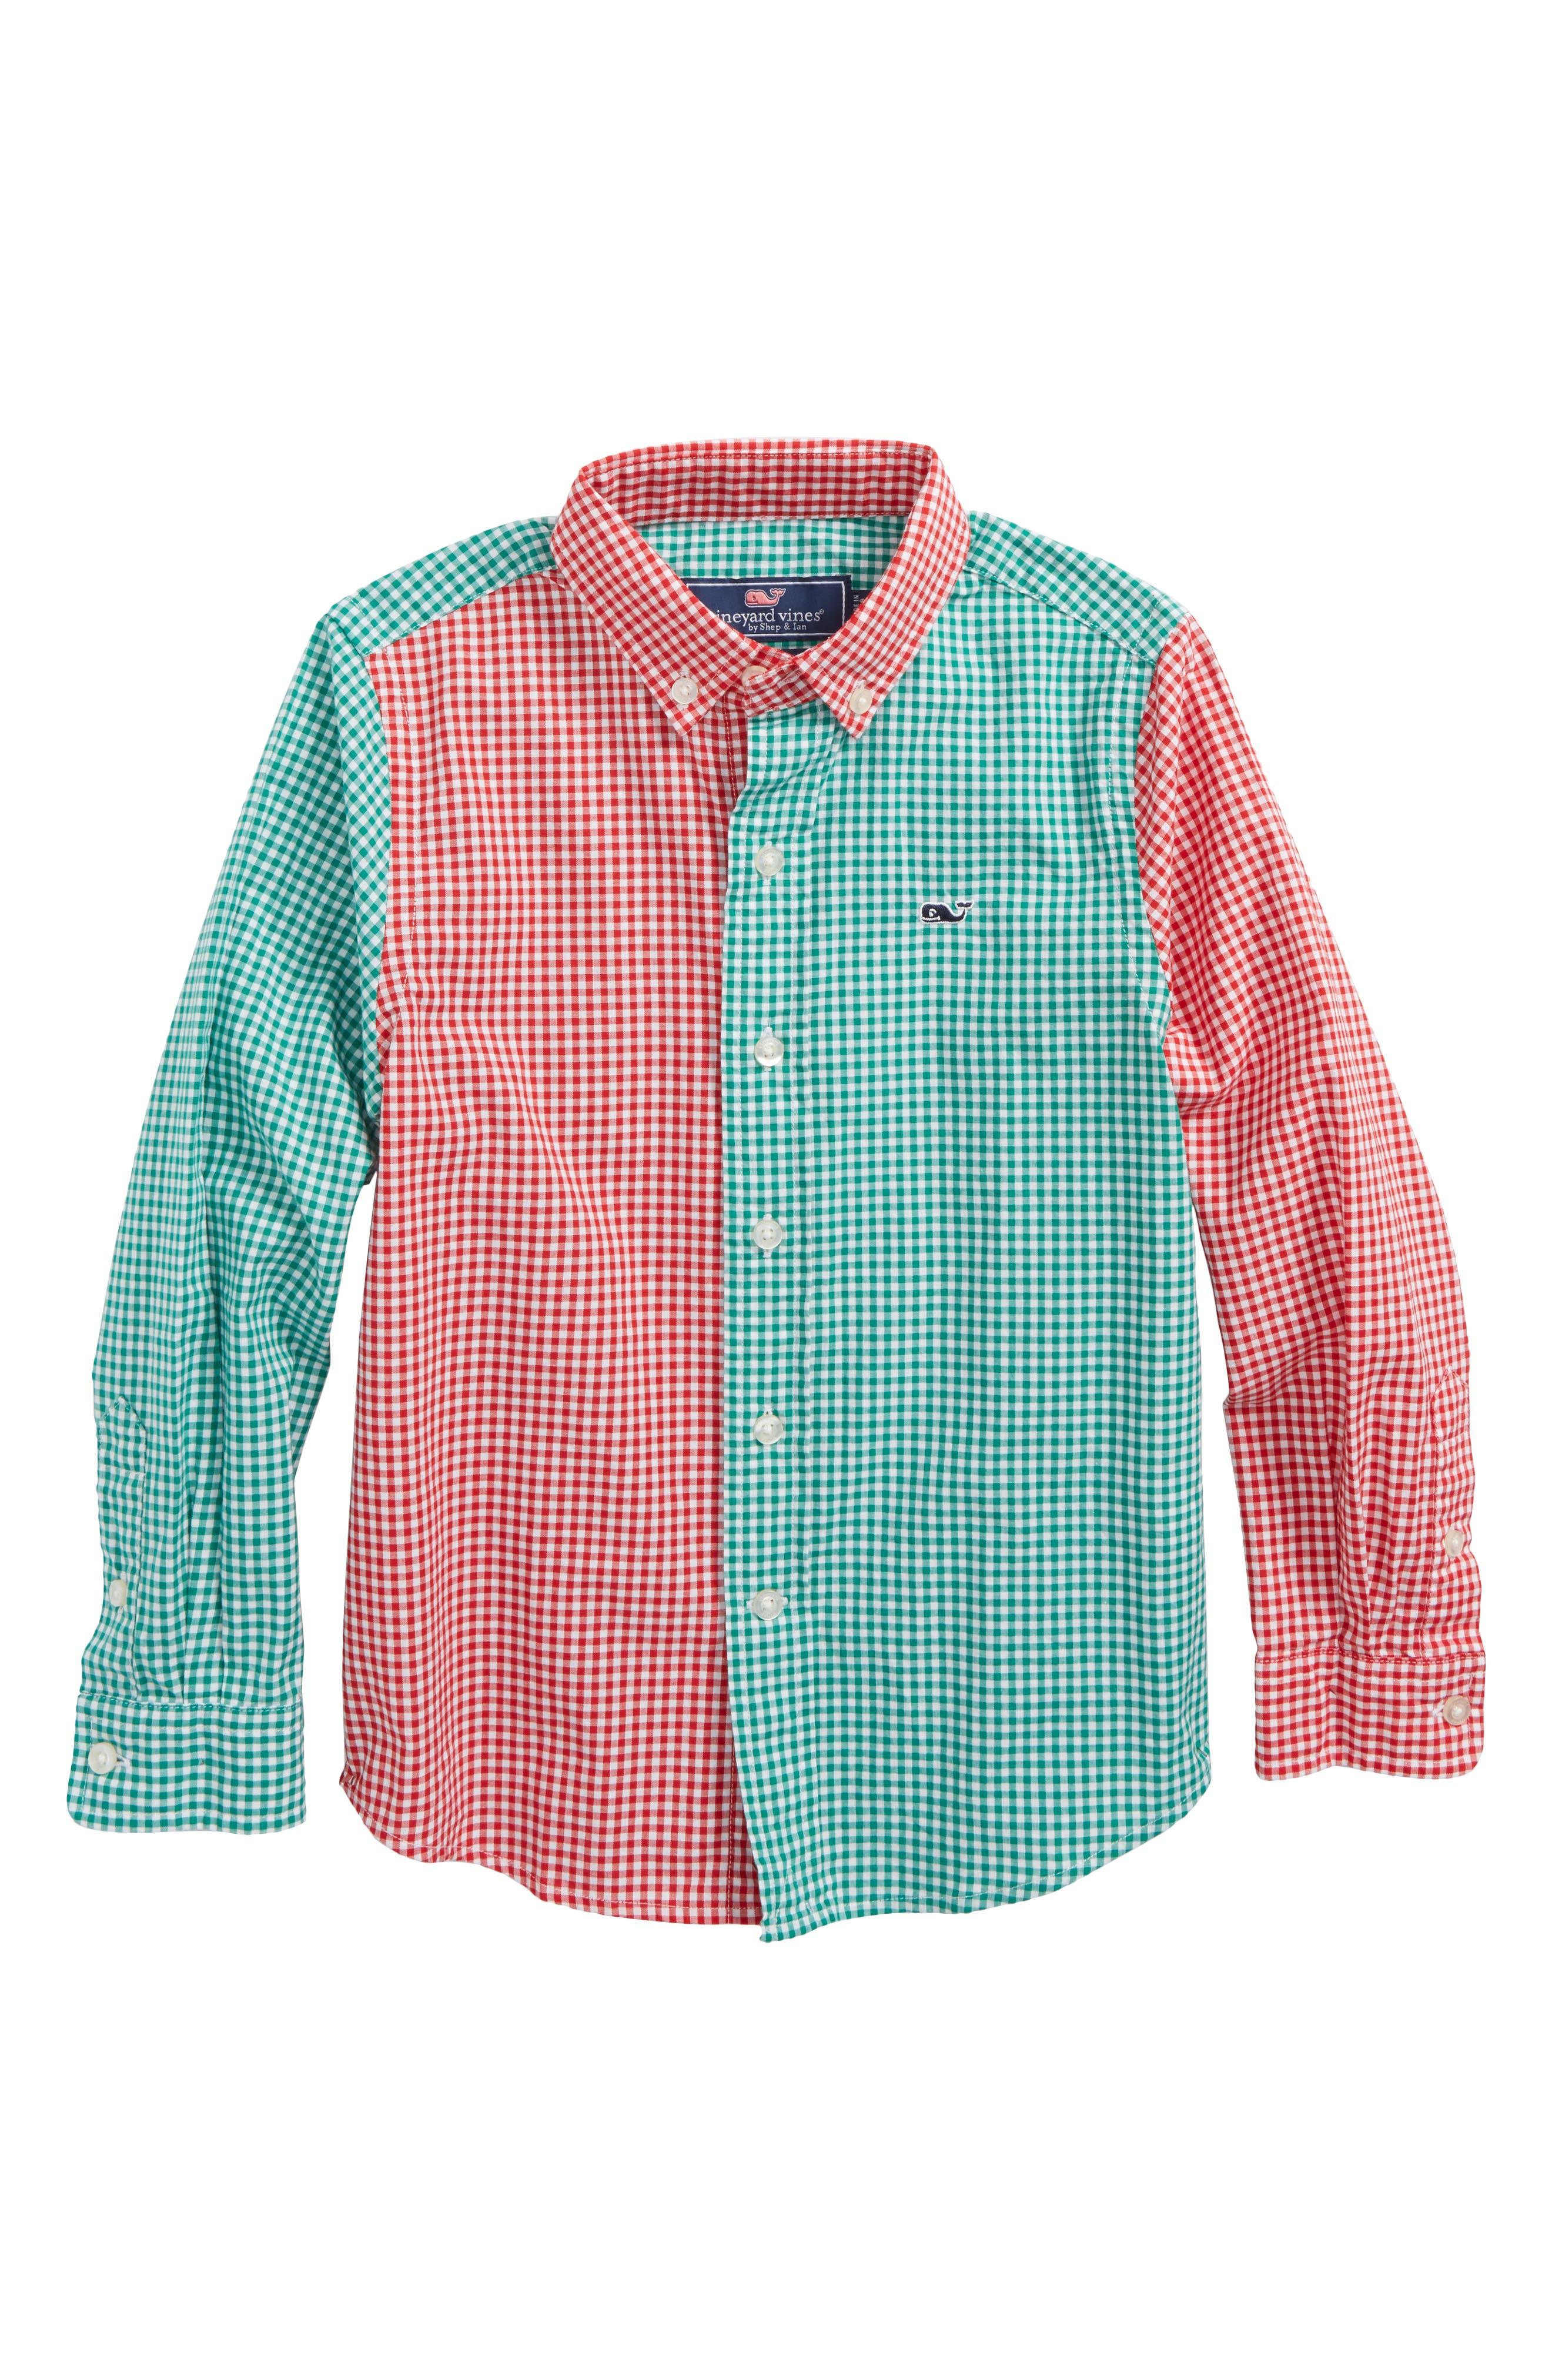 Party Gingham Plaid Shirt,                             Main thumbnail 1, color,                             400